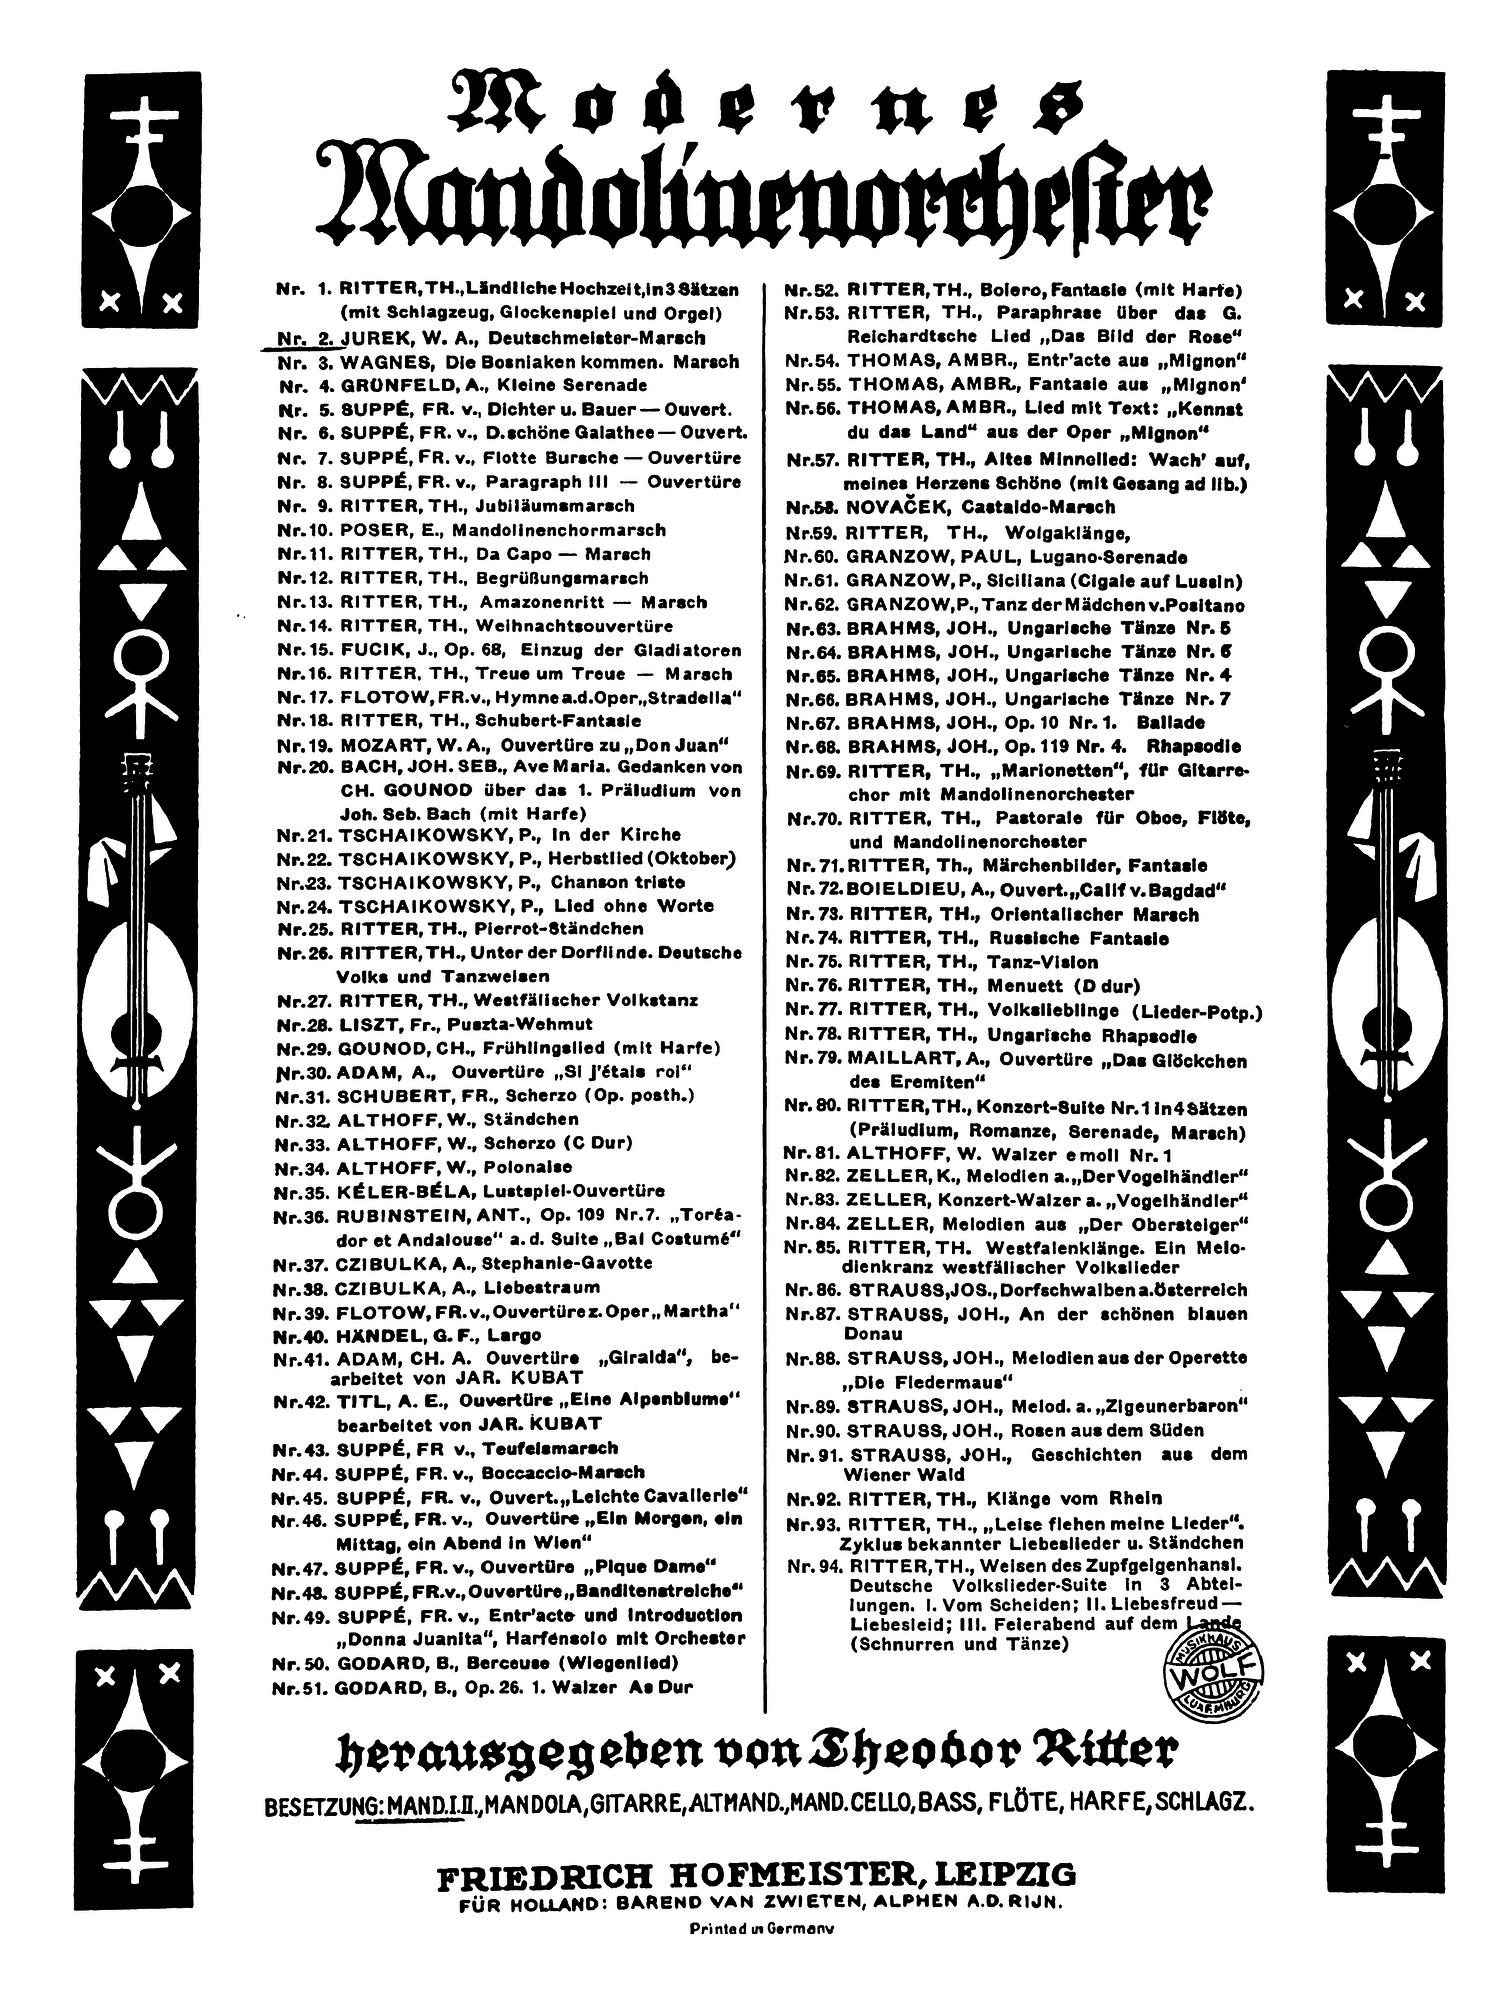 Theodor Ritter - Modernes Mandolinenorchester